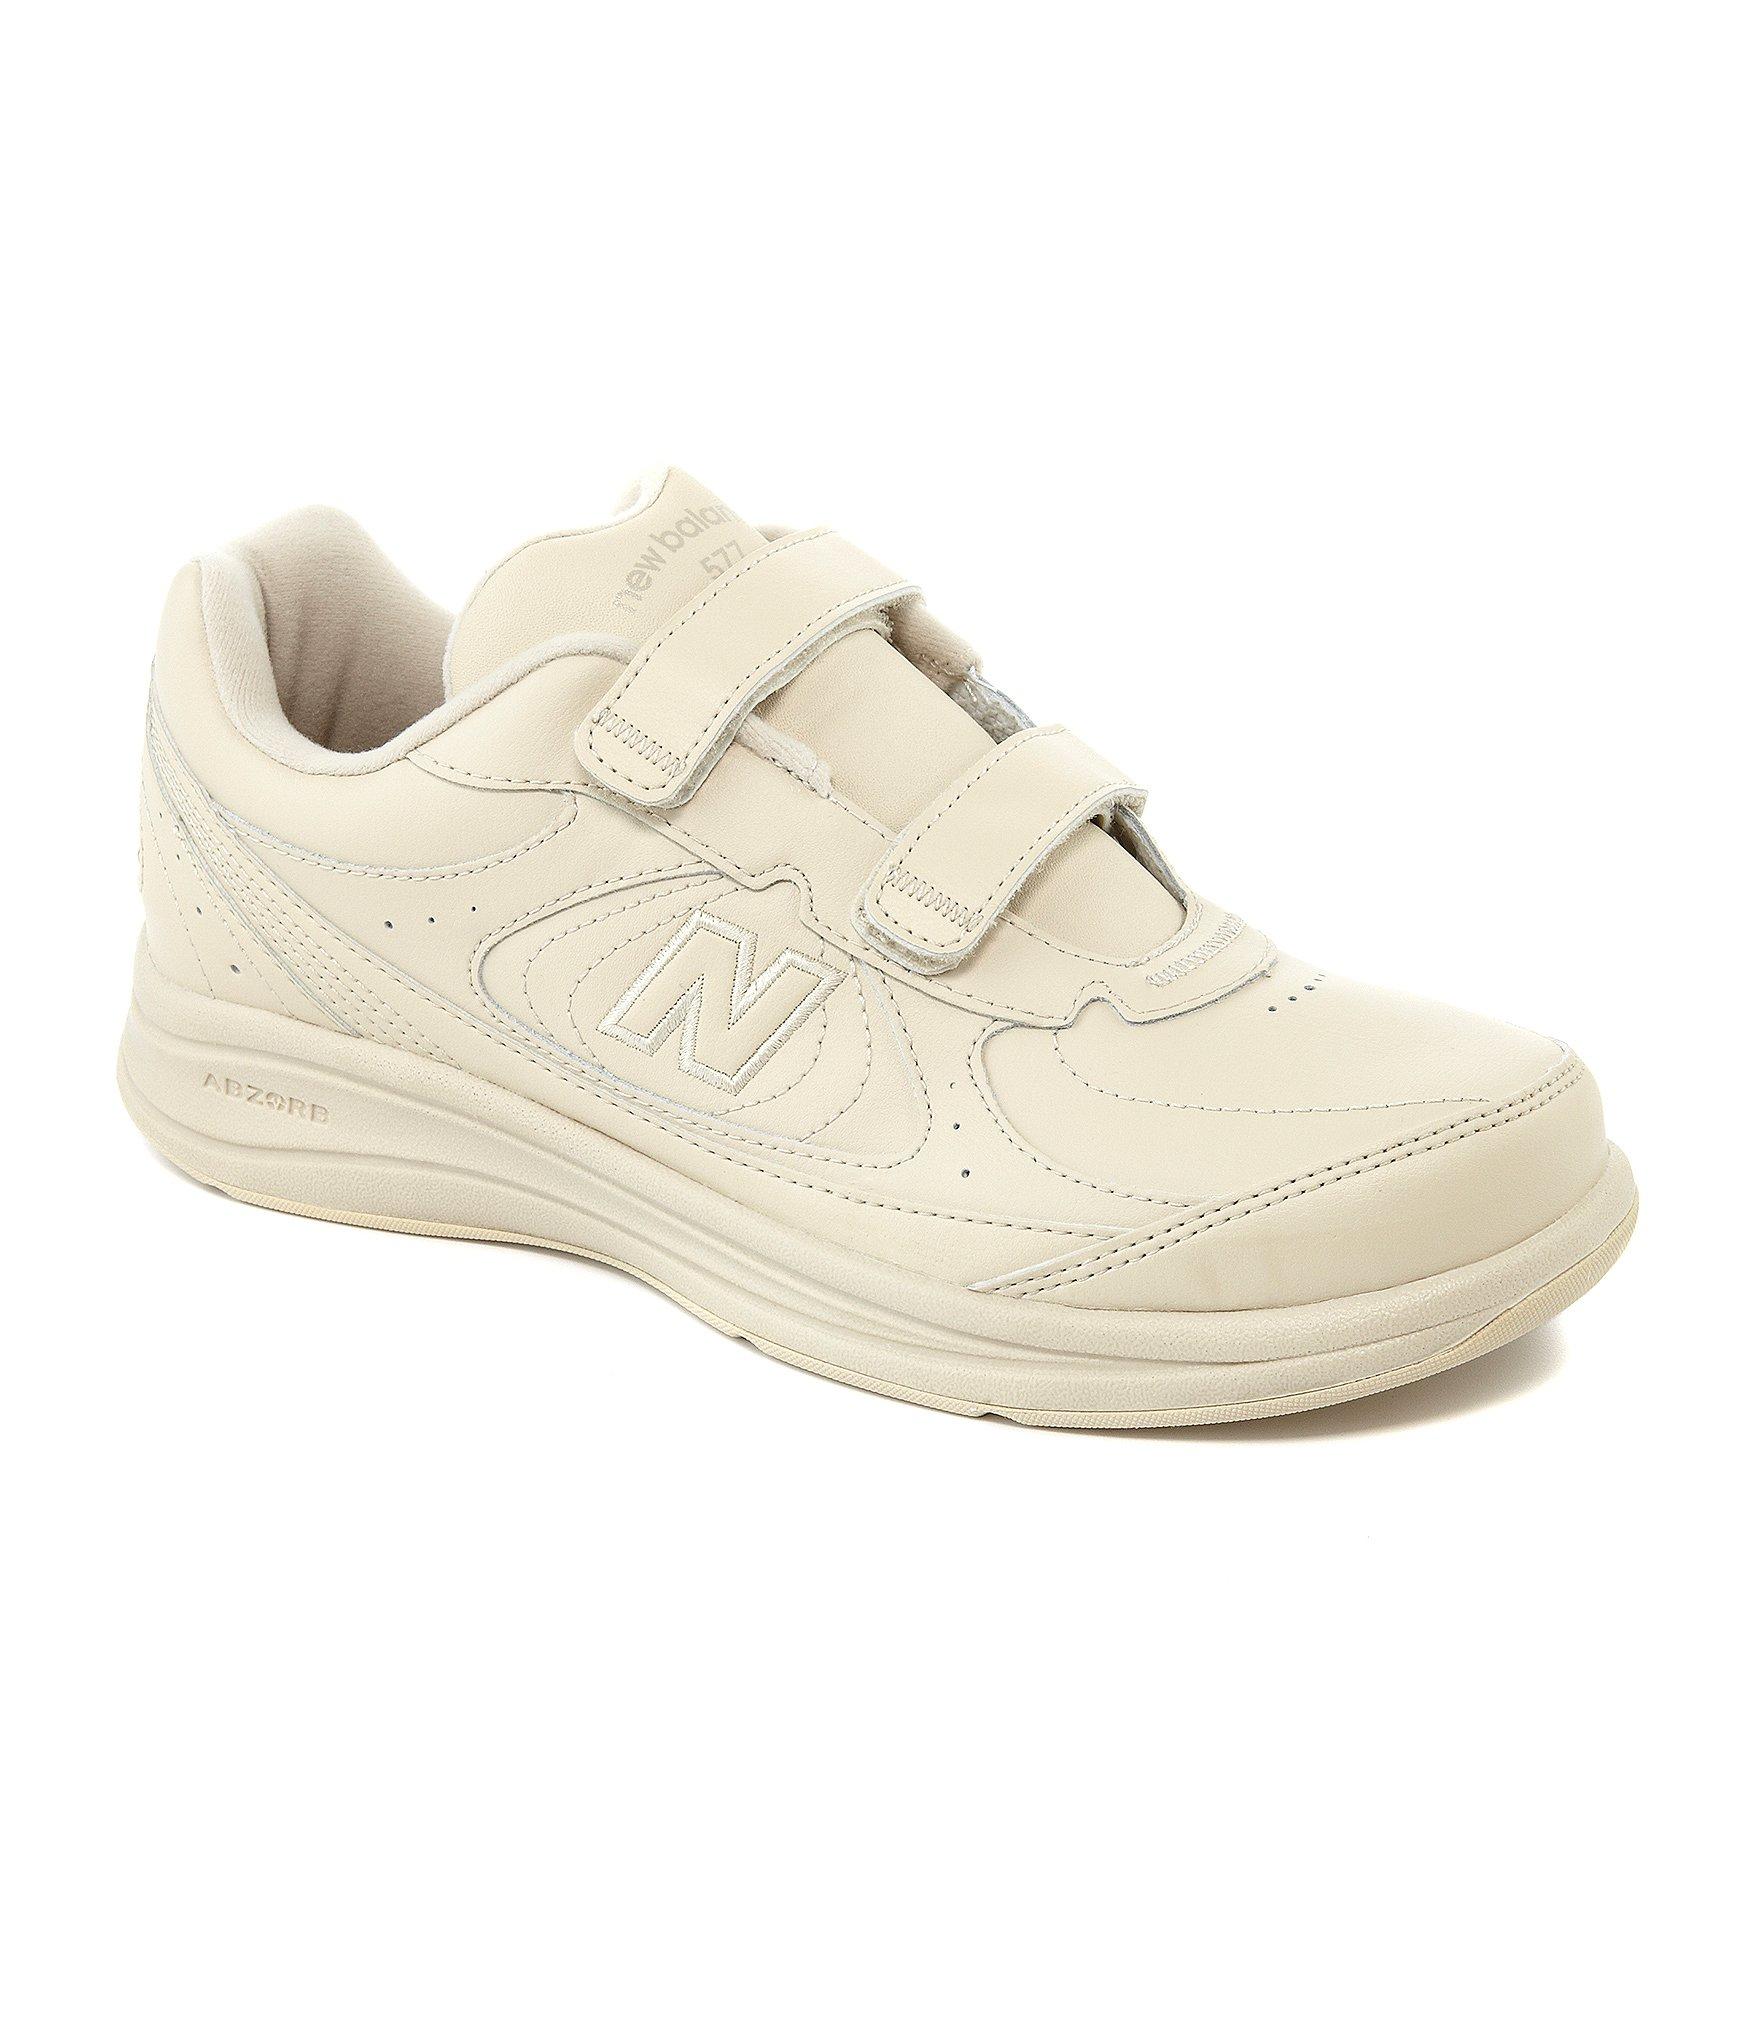 New Balance Health Walking Shoes Men